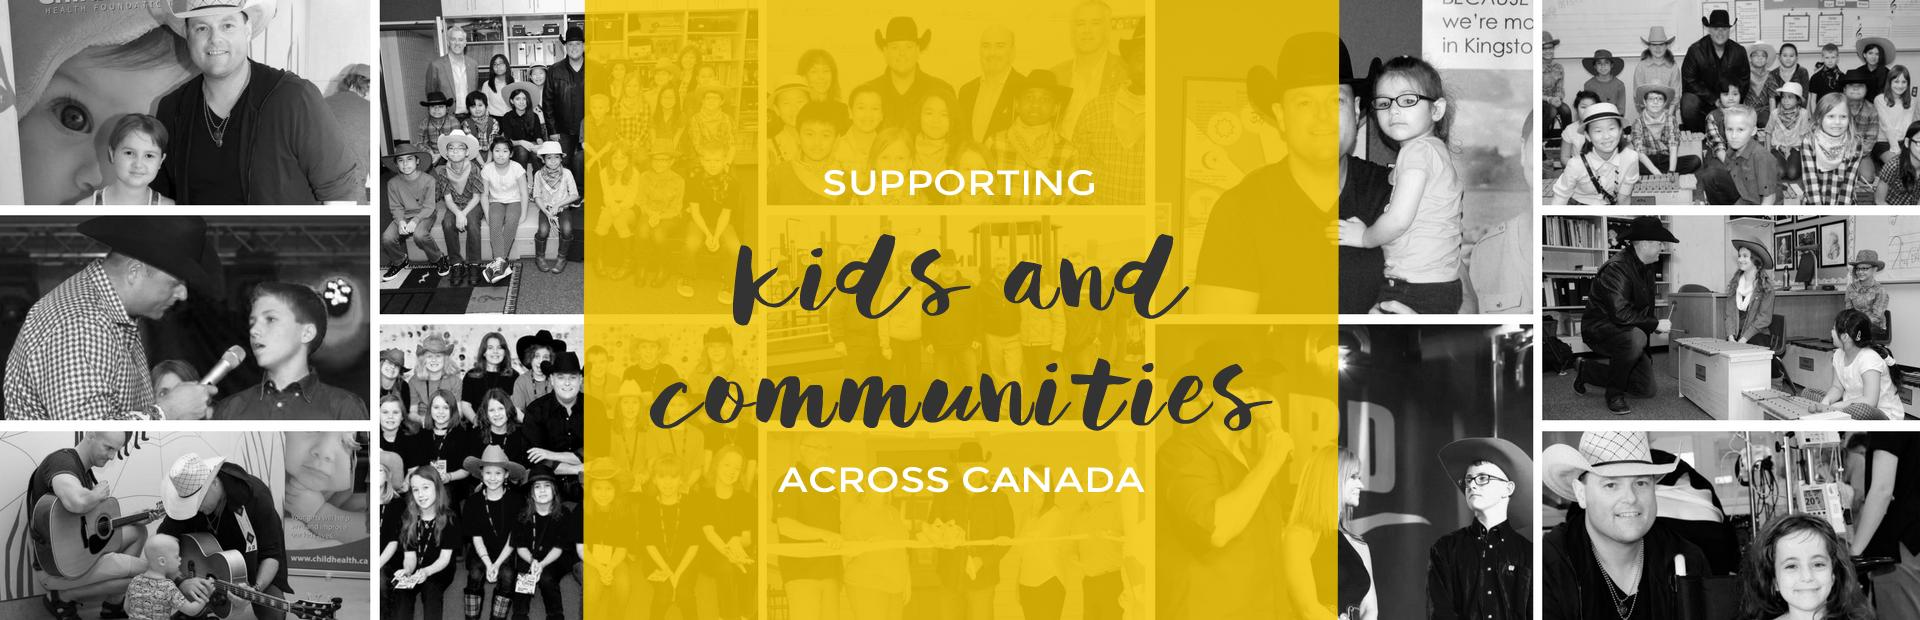 Gord Bamford Foundation supports kids